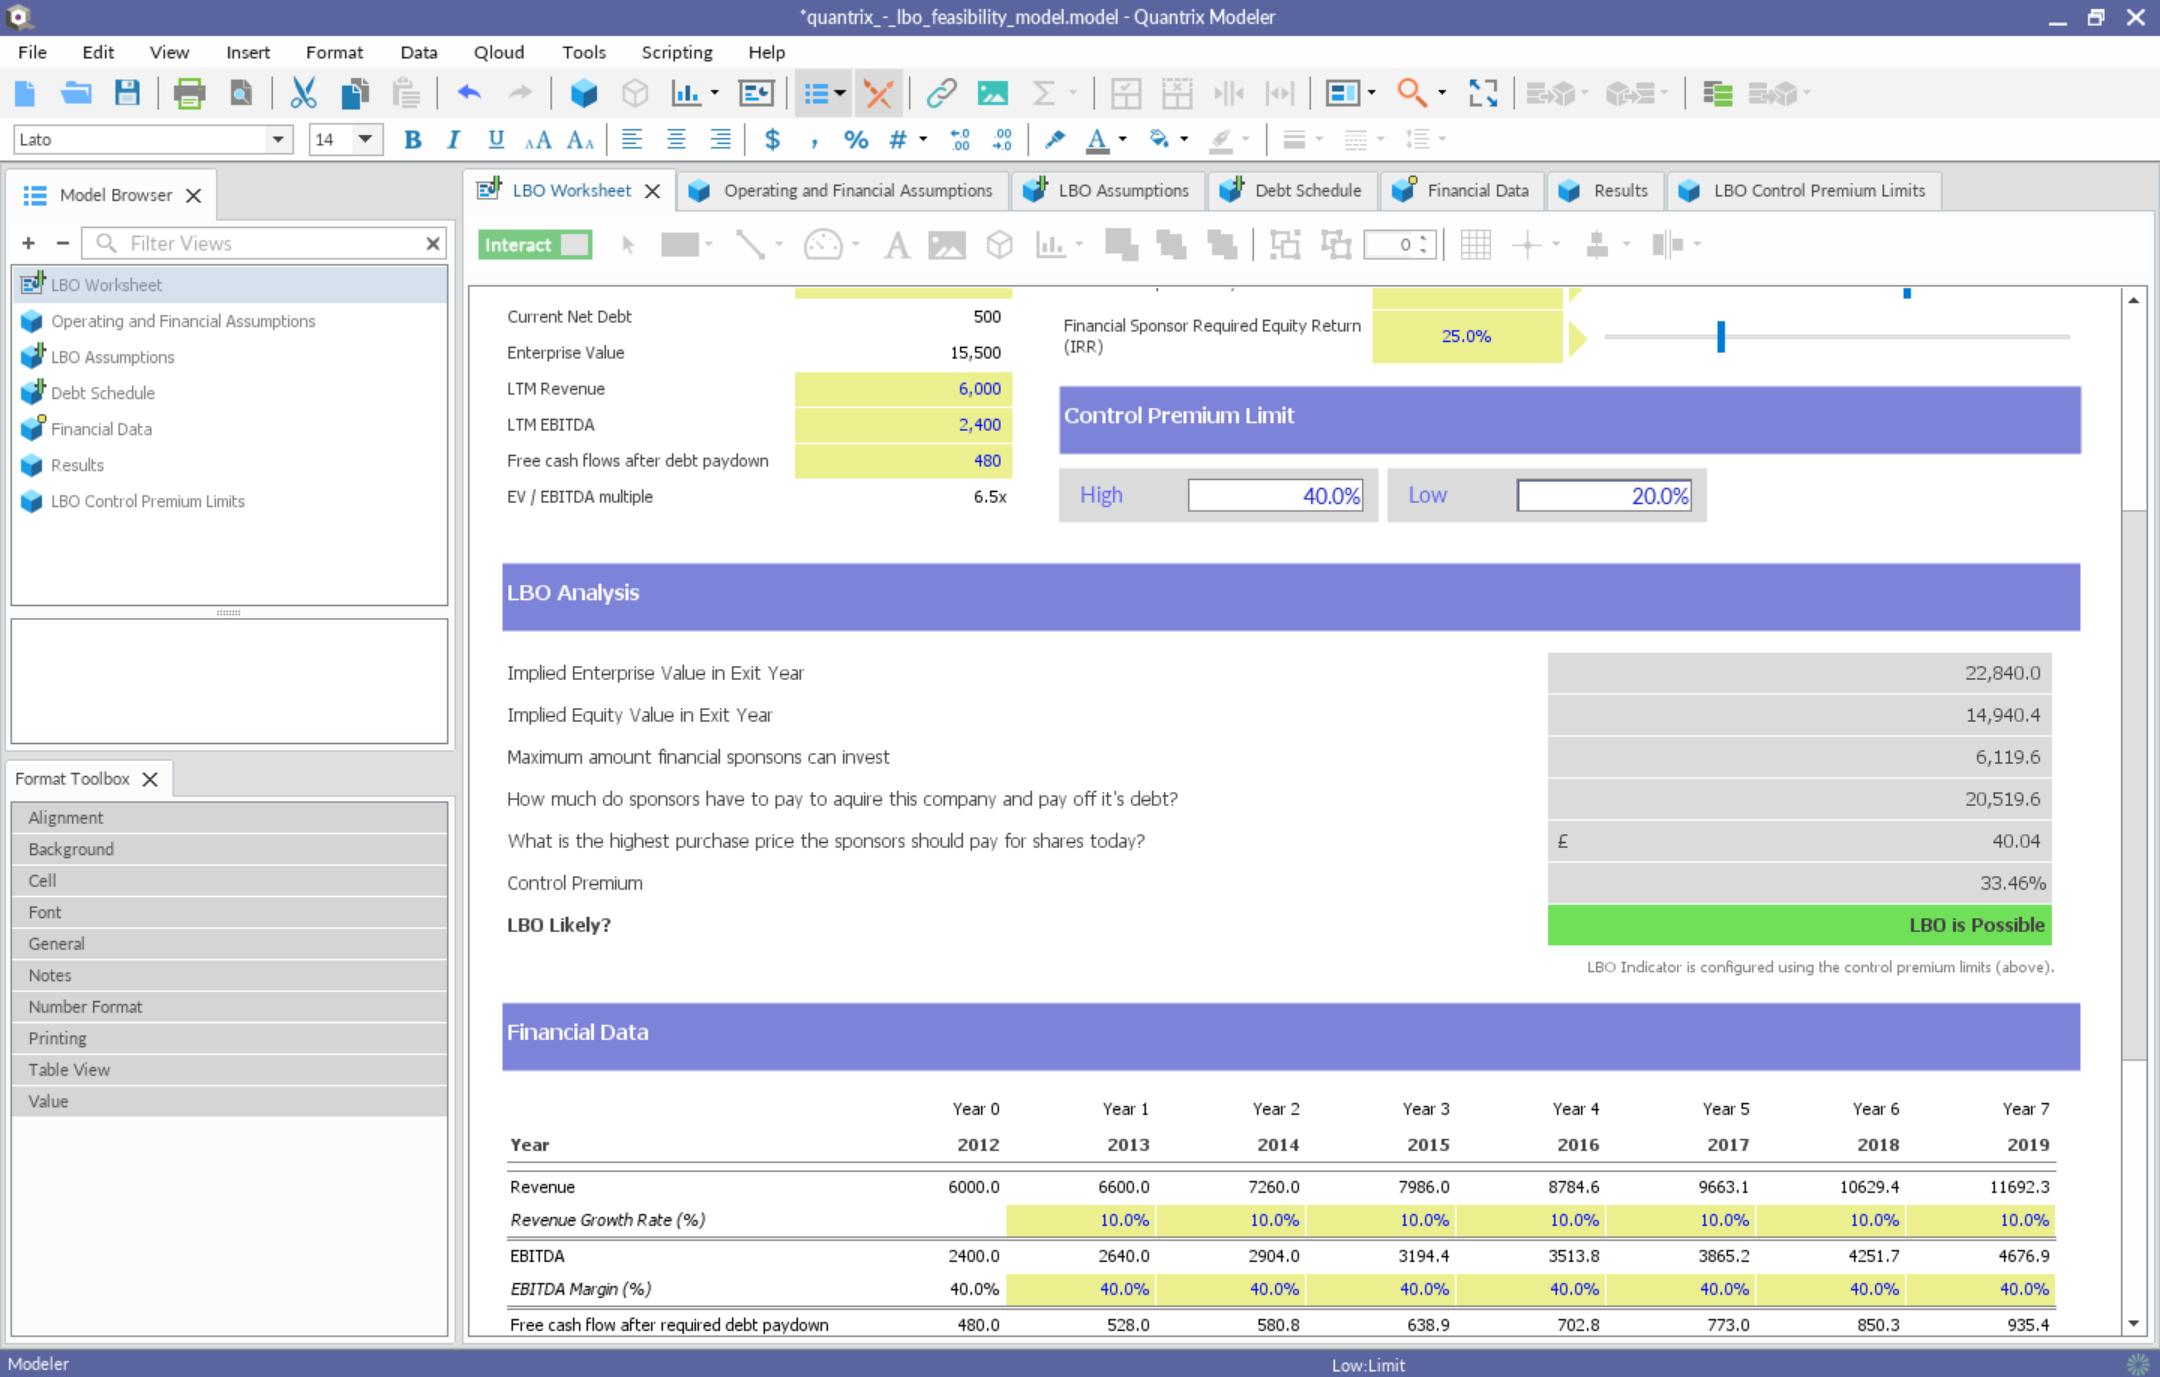 Quantrix Modeler | FileForum